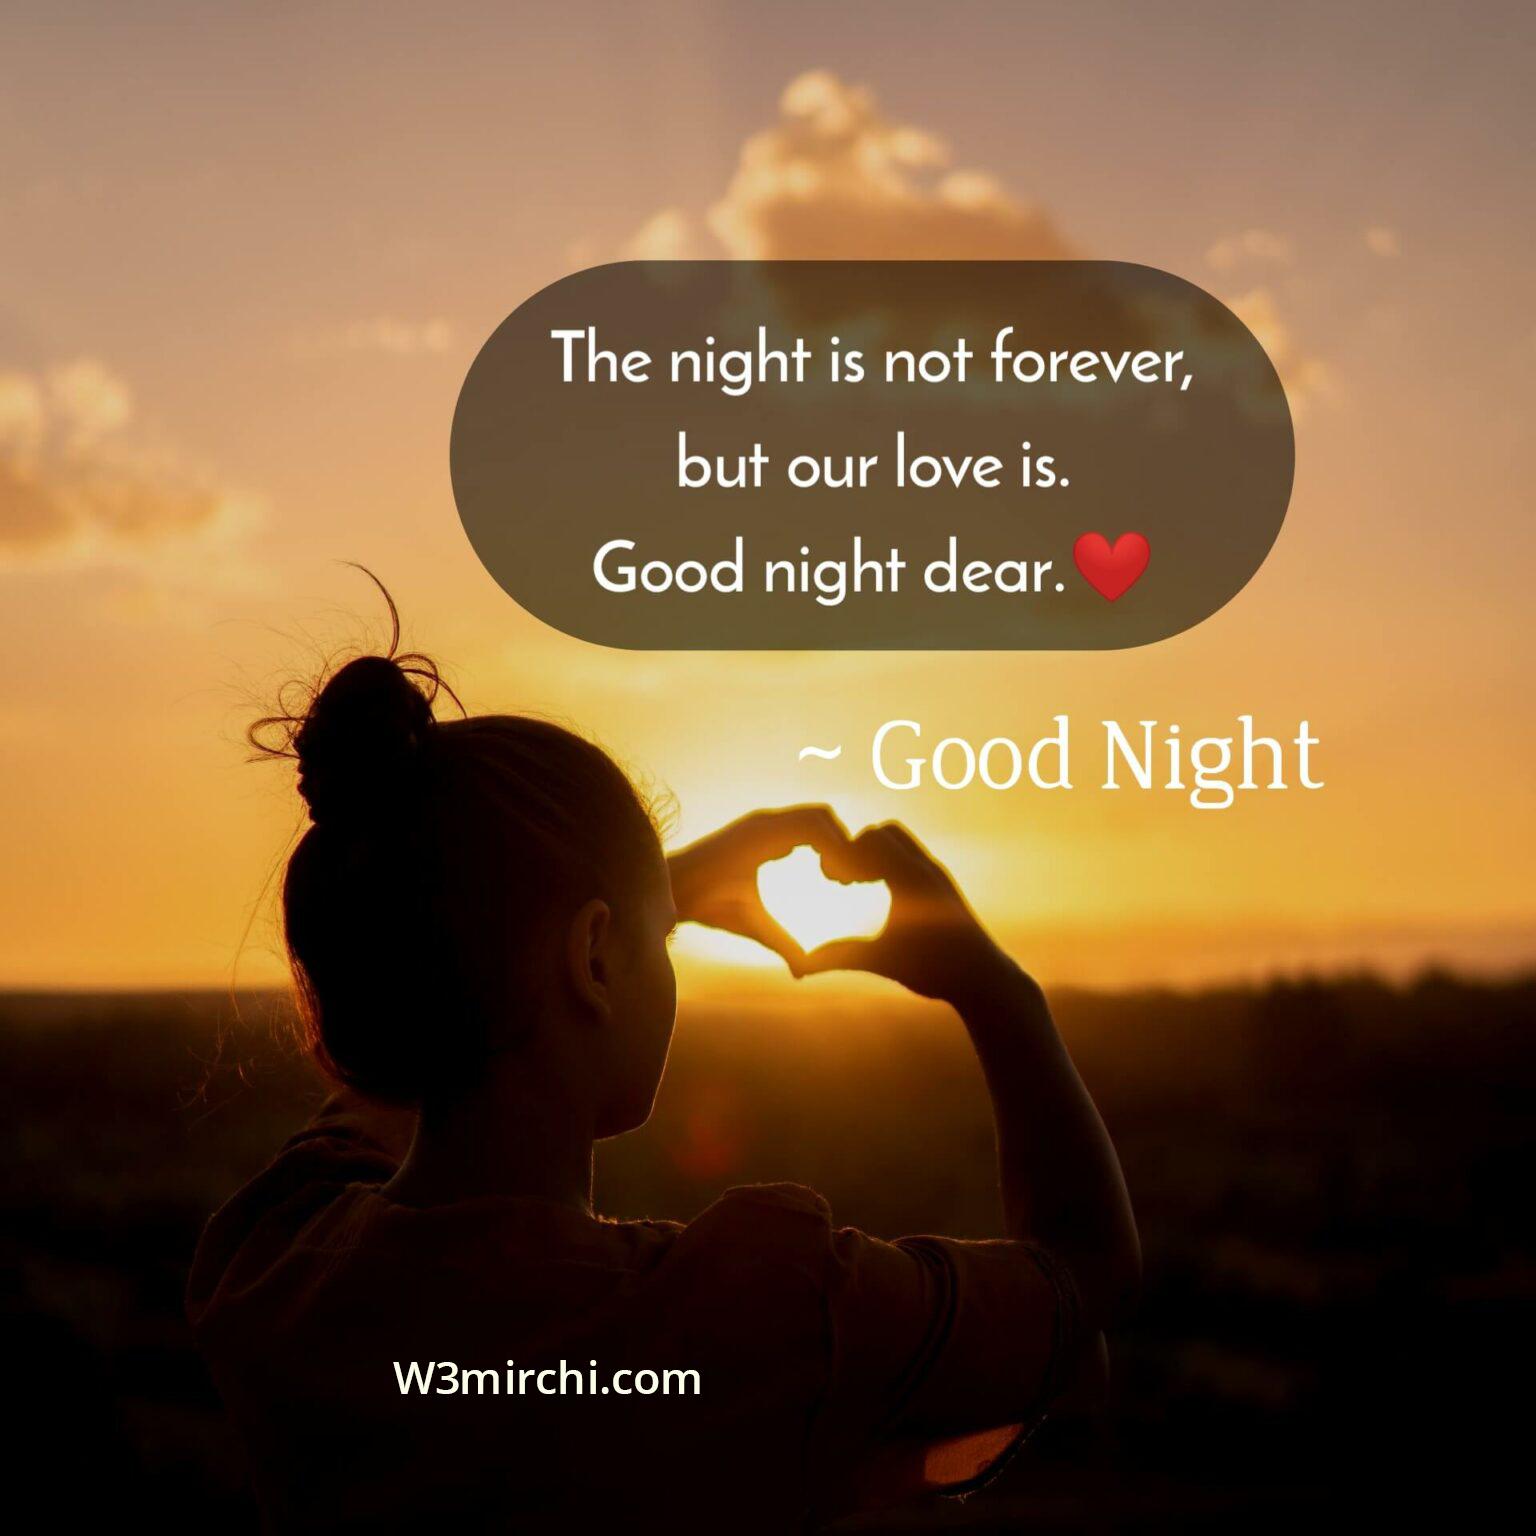 Good night dear.❤